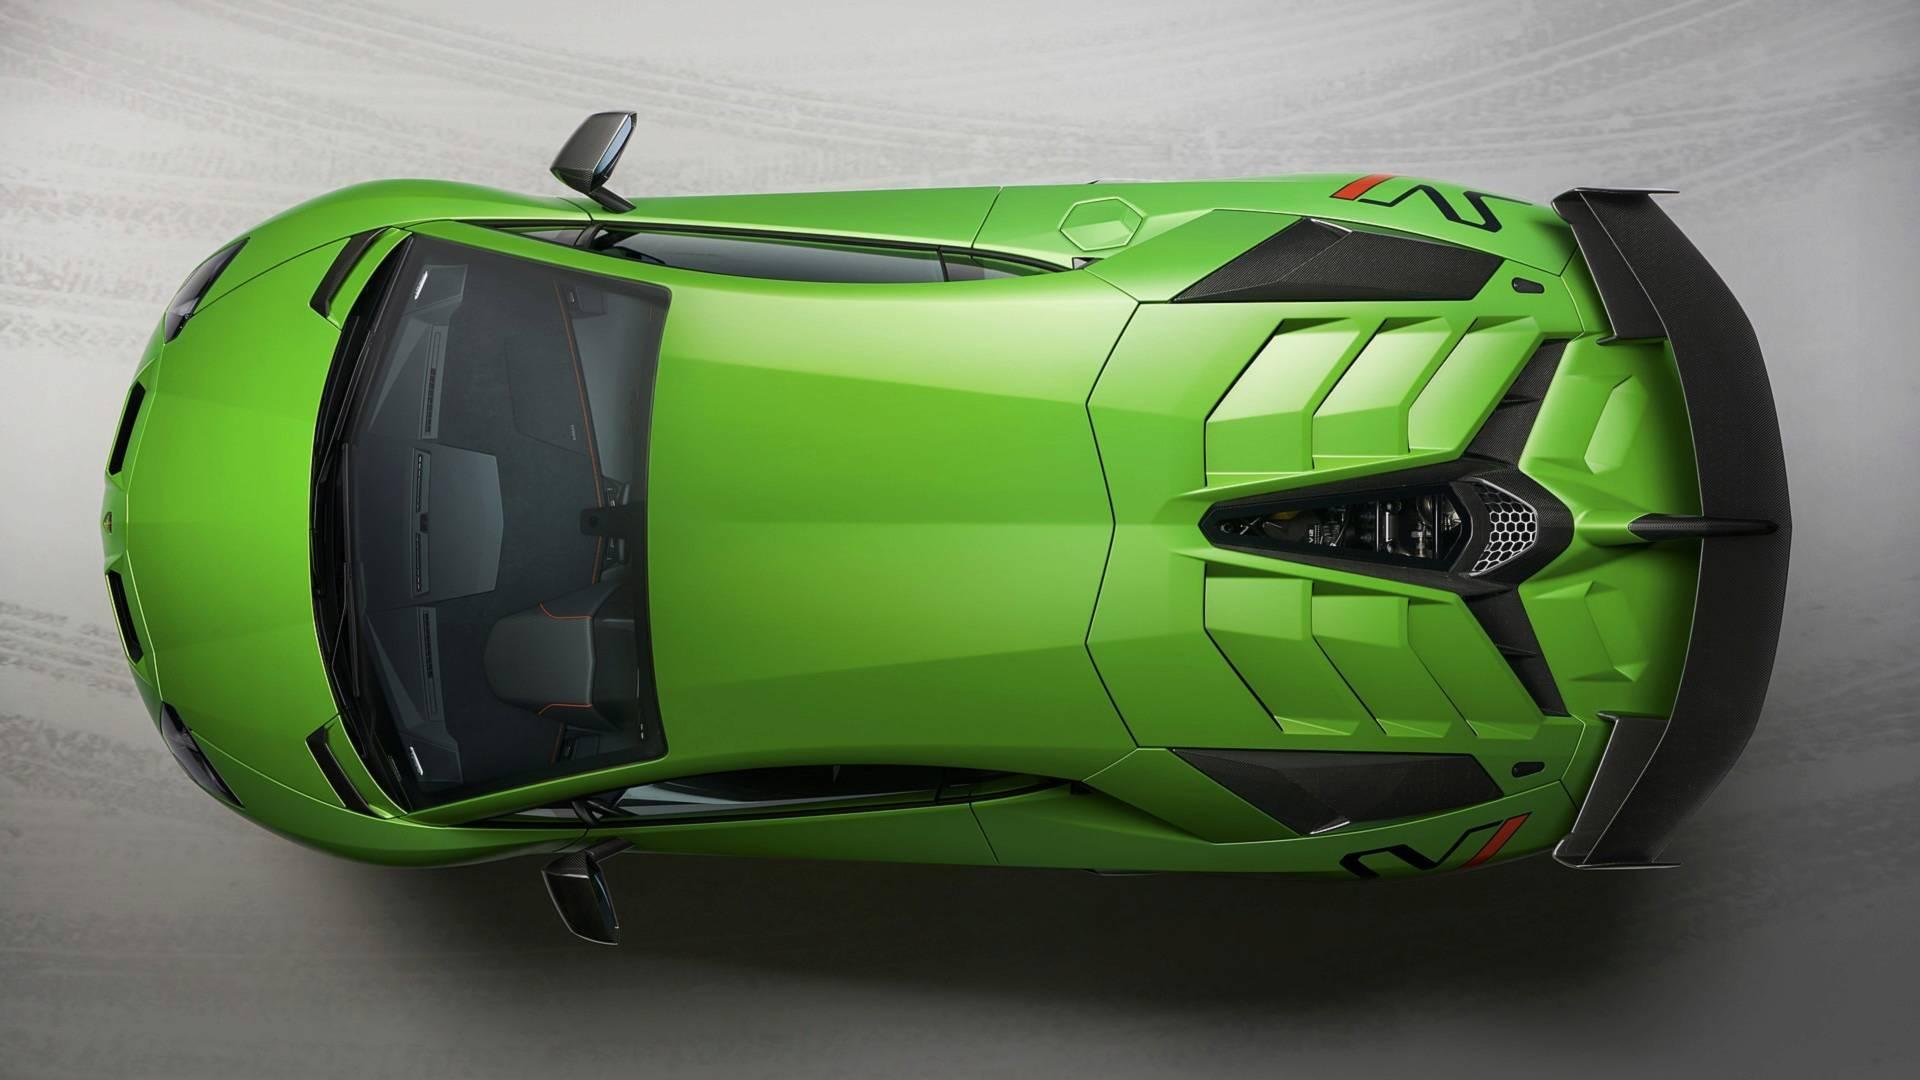 2019 Lamborghini Aventador Svj Revealed Priced At 517 700 Autoevolution